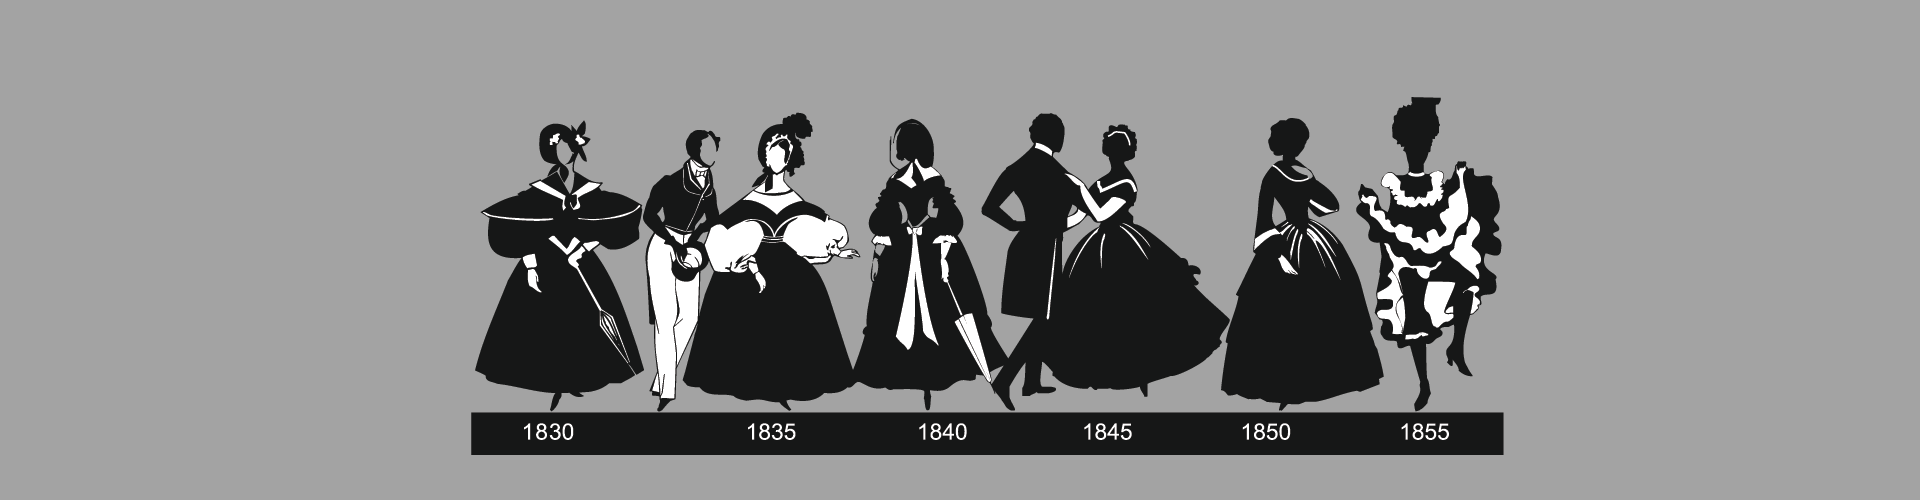 1830 to 1855